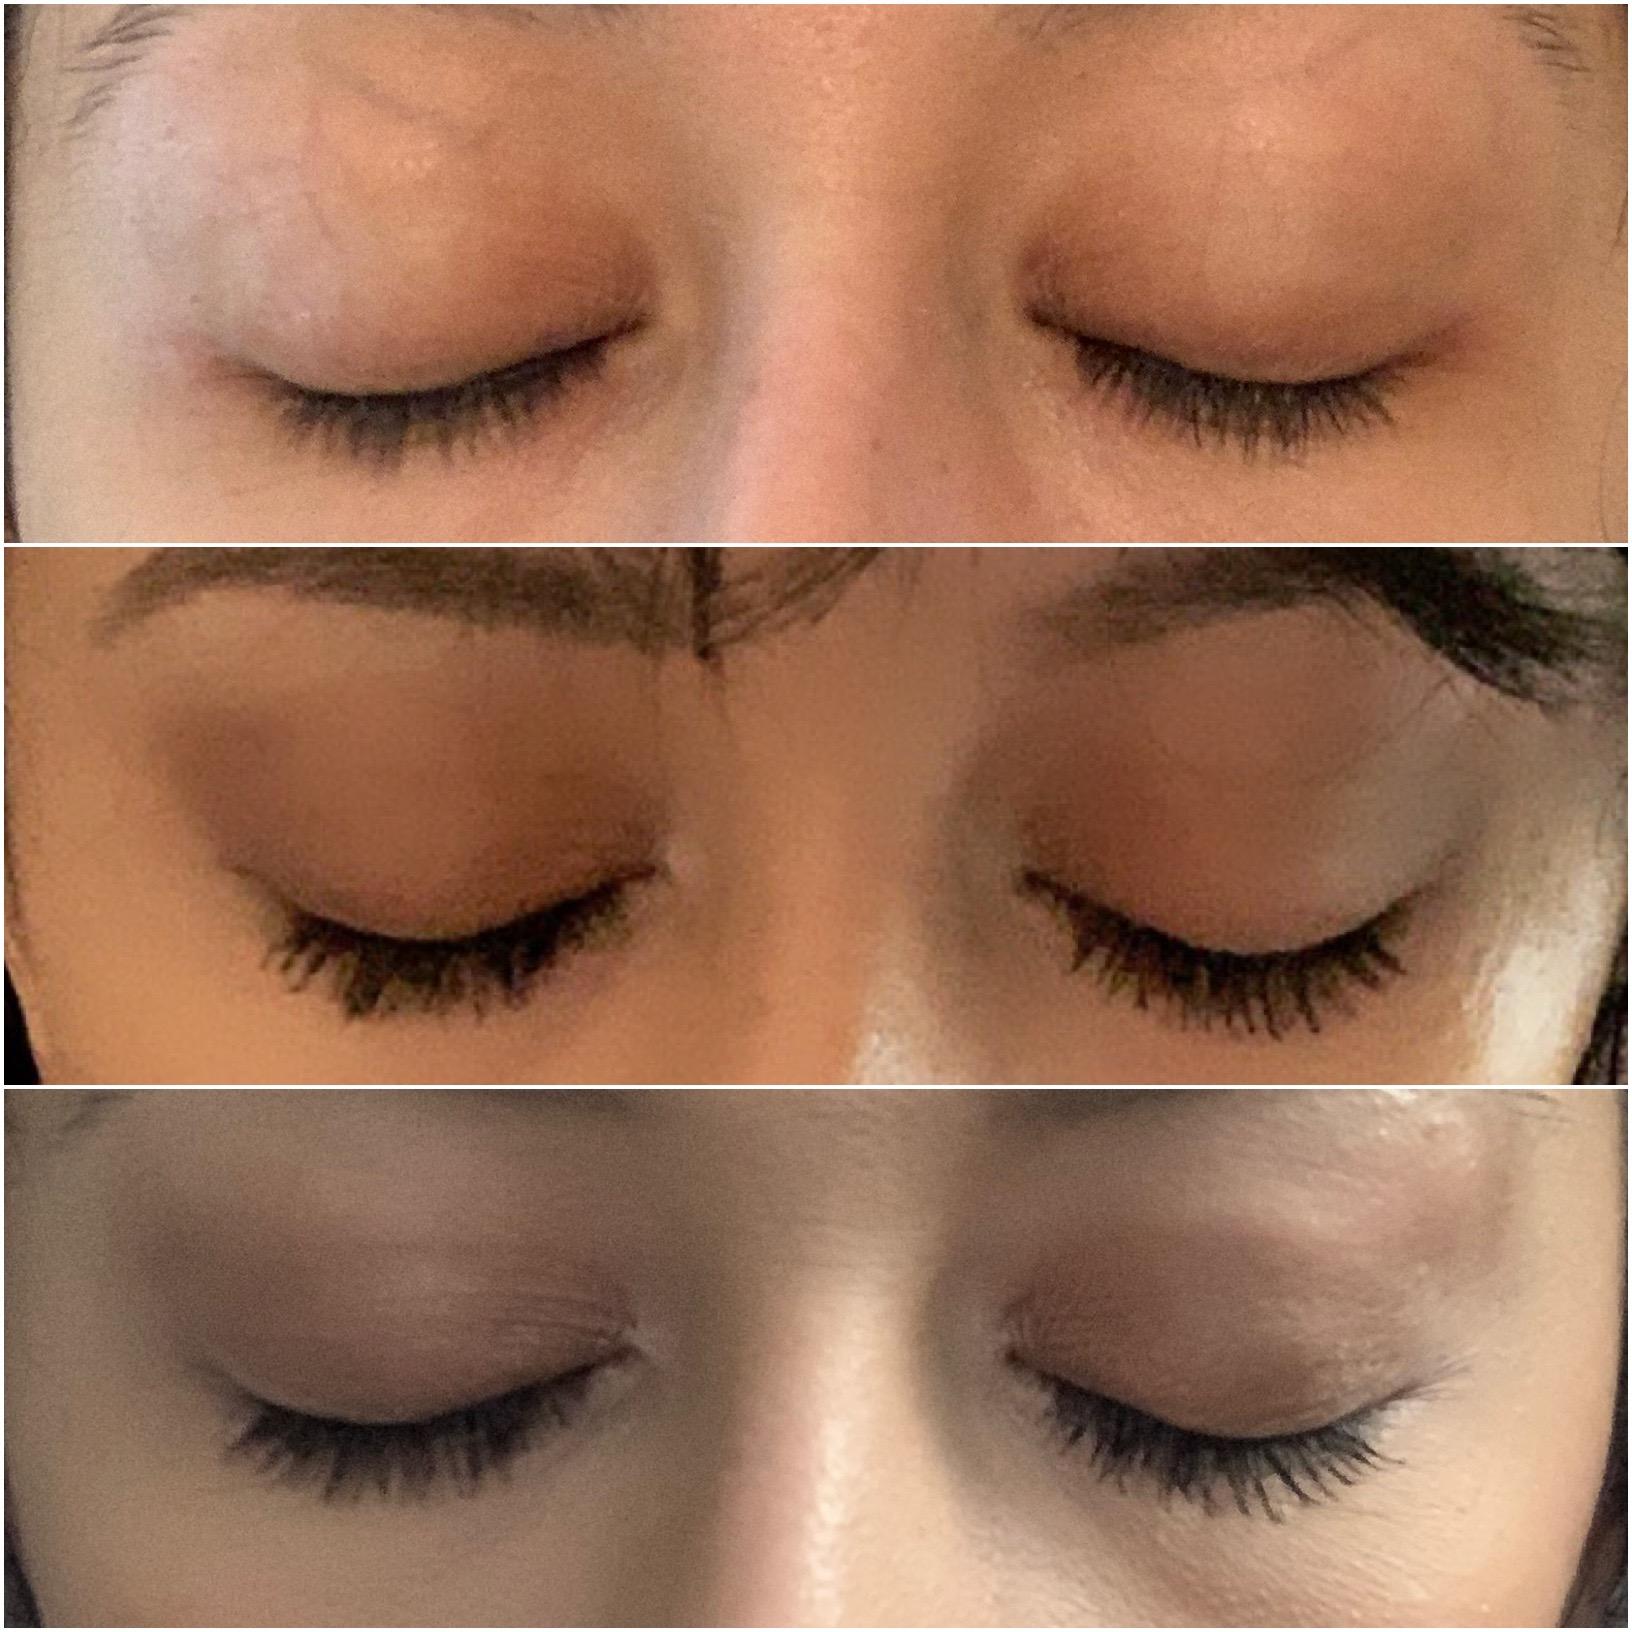 Results using Public Beauty eyelash growth serum